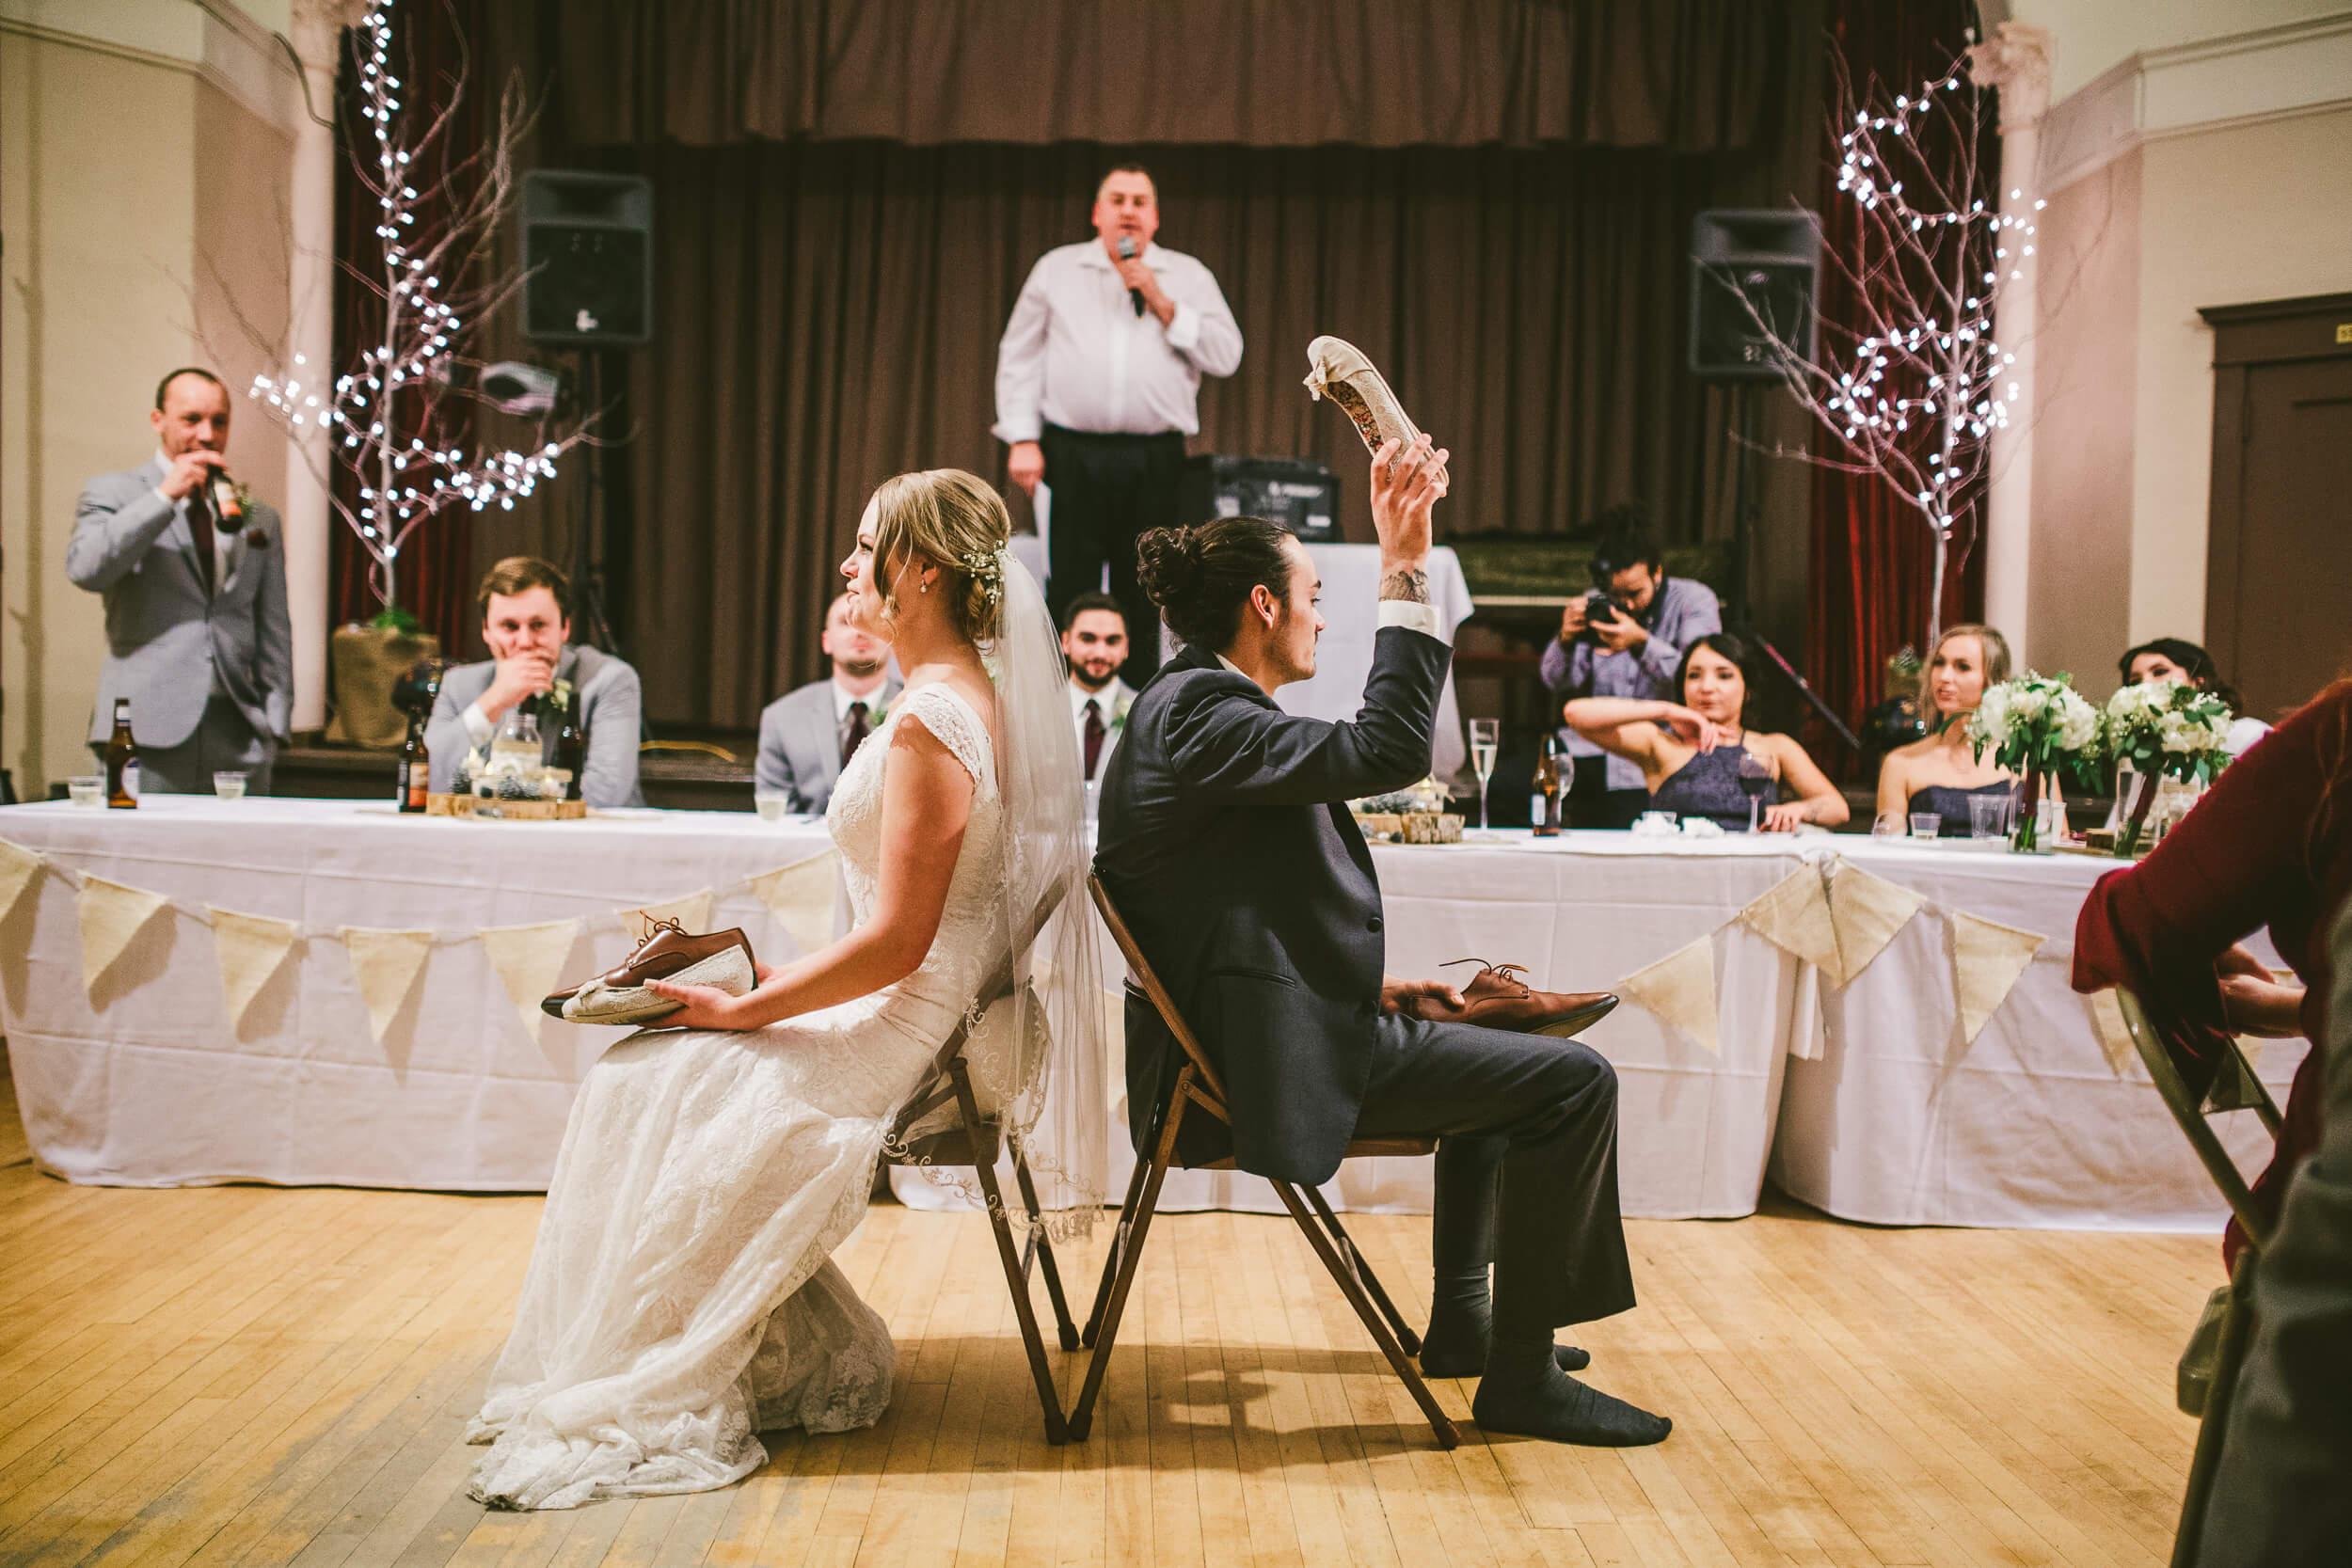 mukogawa winter wedding in spokane (268).jpg